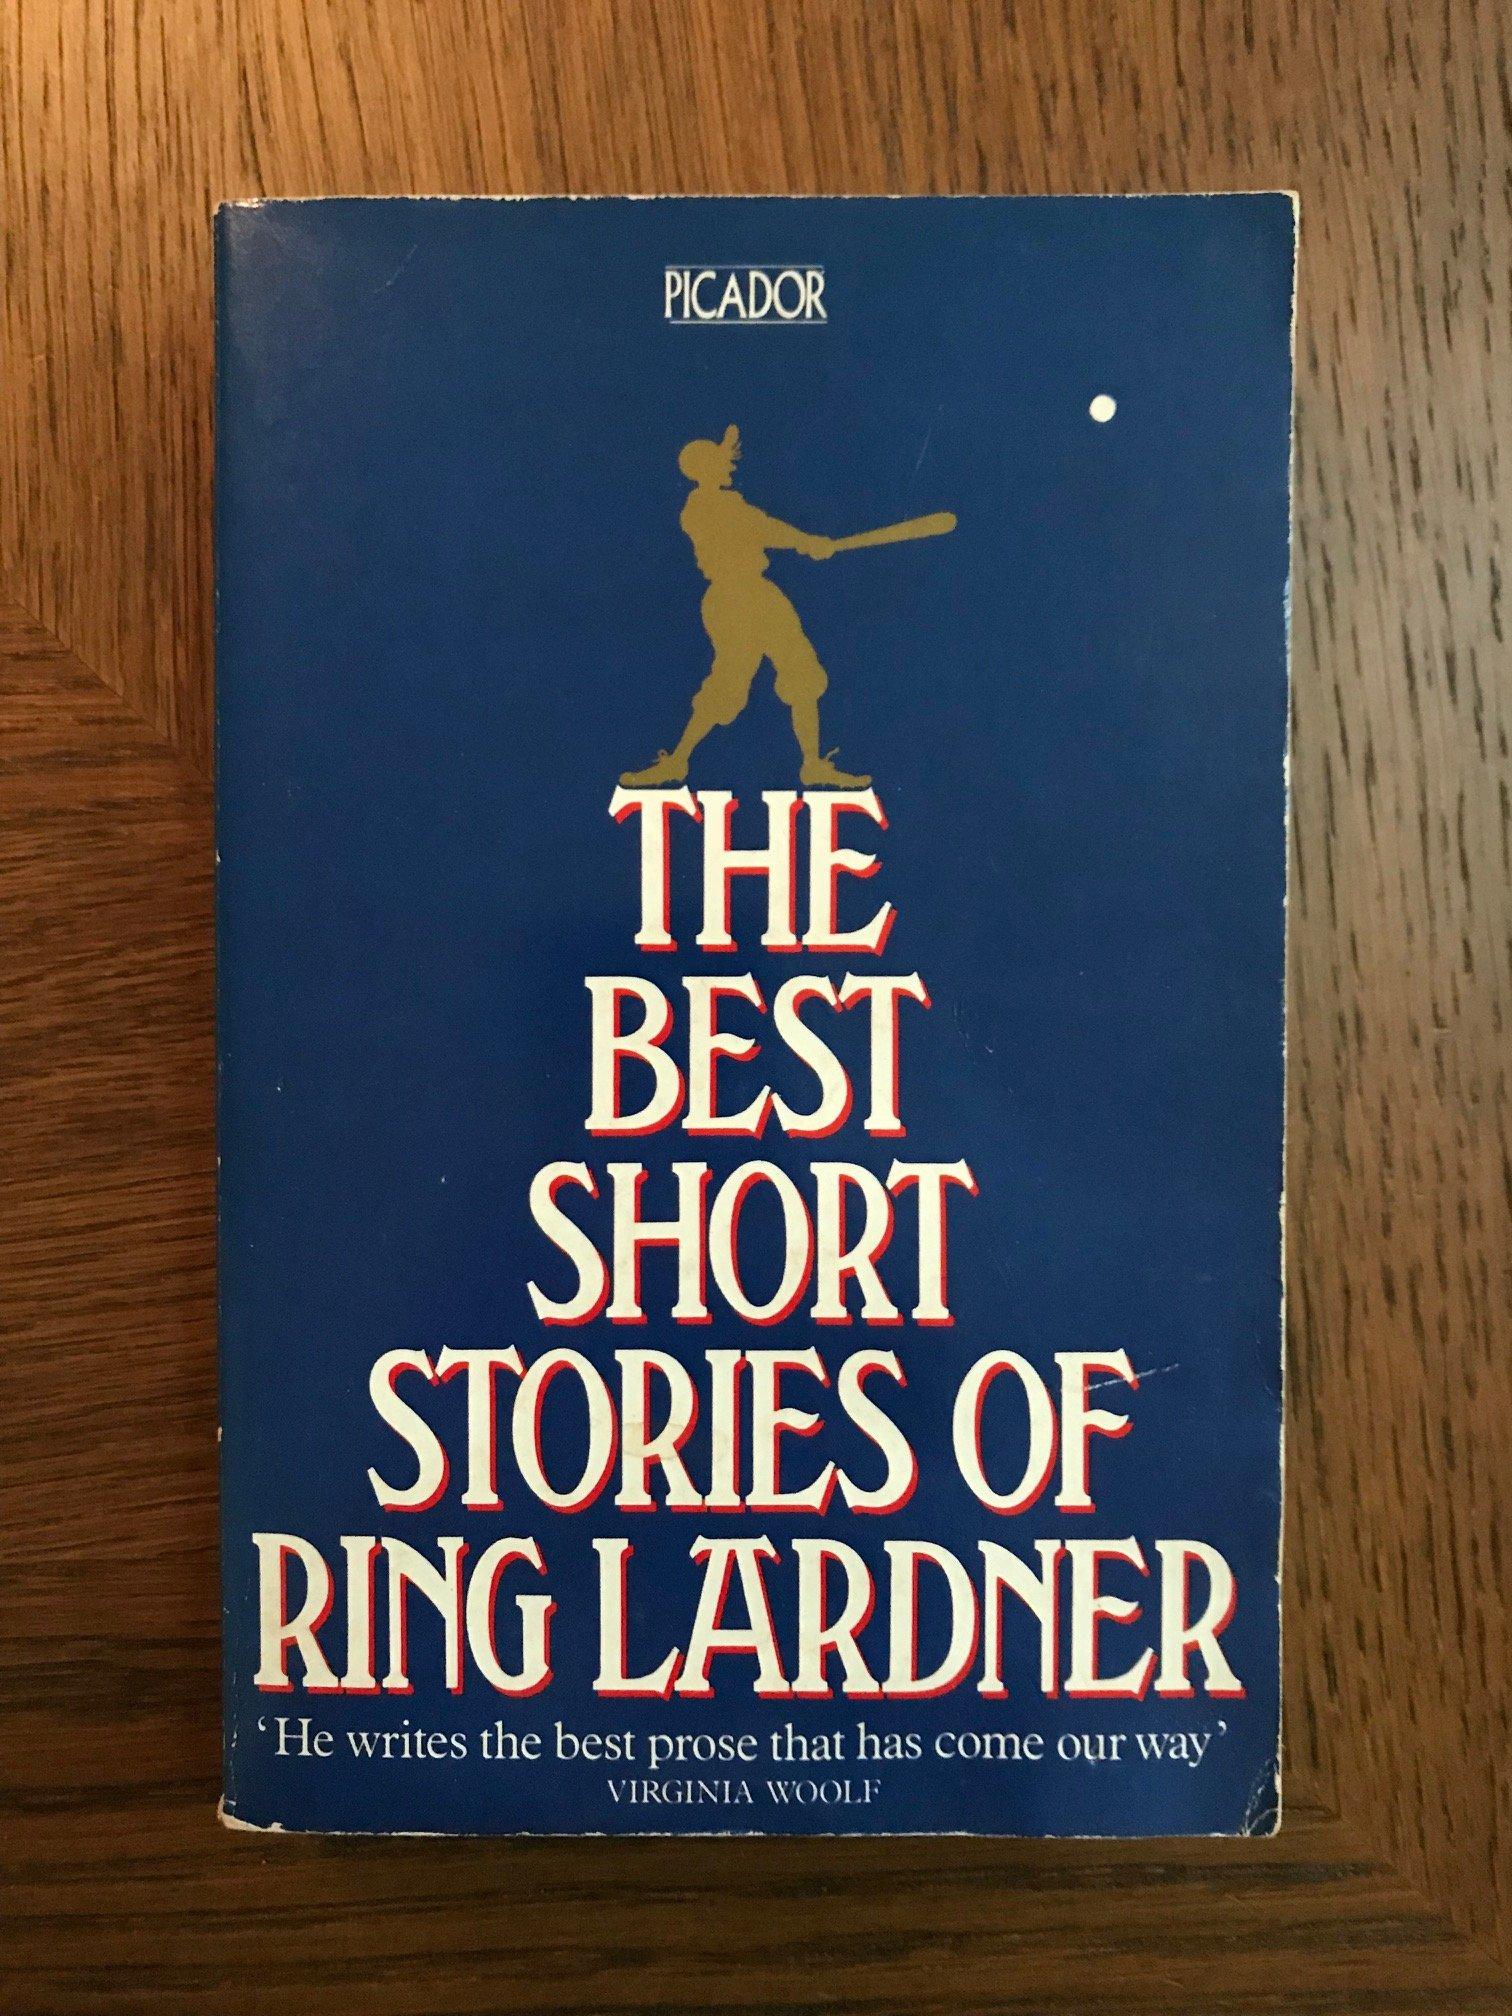 The Best Short Stories Picador Books Amazon Ring Lardner